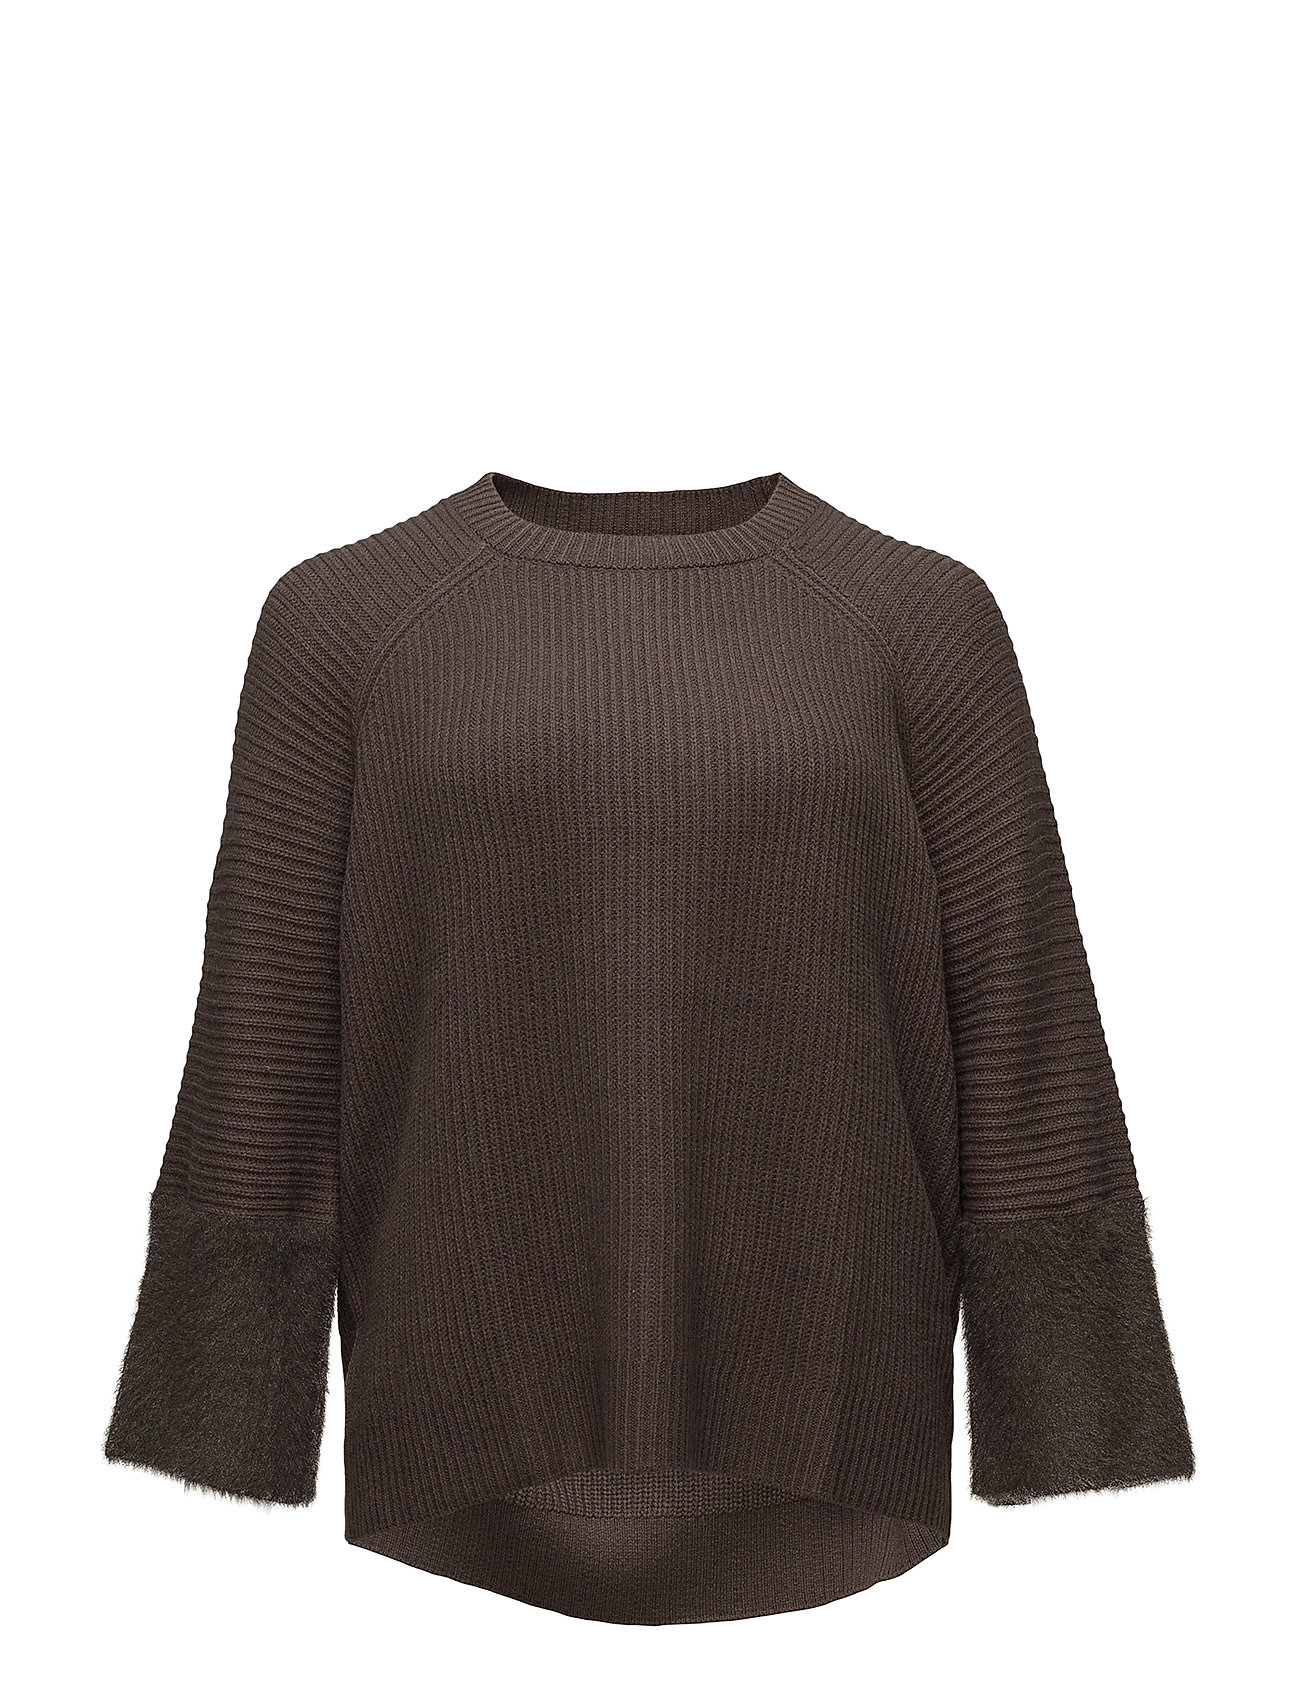 violeta by mango Texture sleeve sweater på boozt.com dk